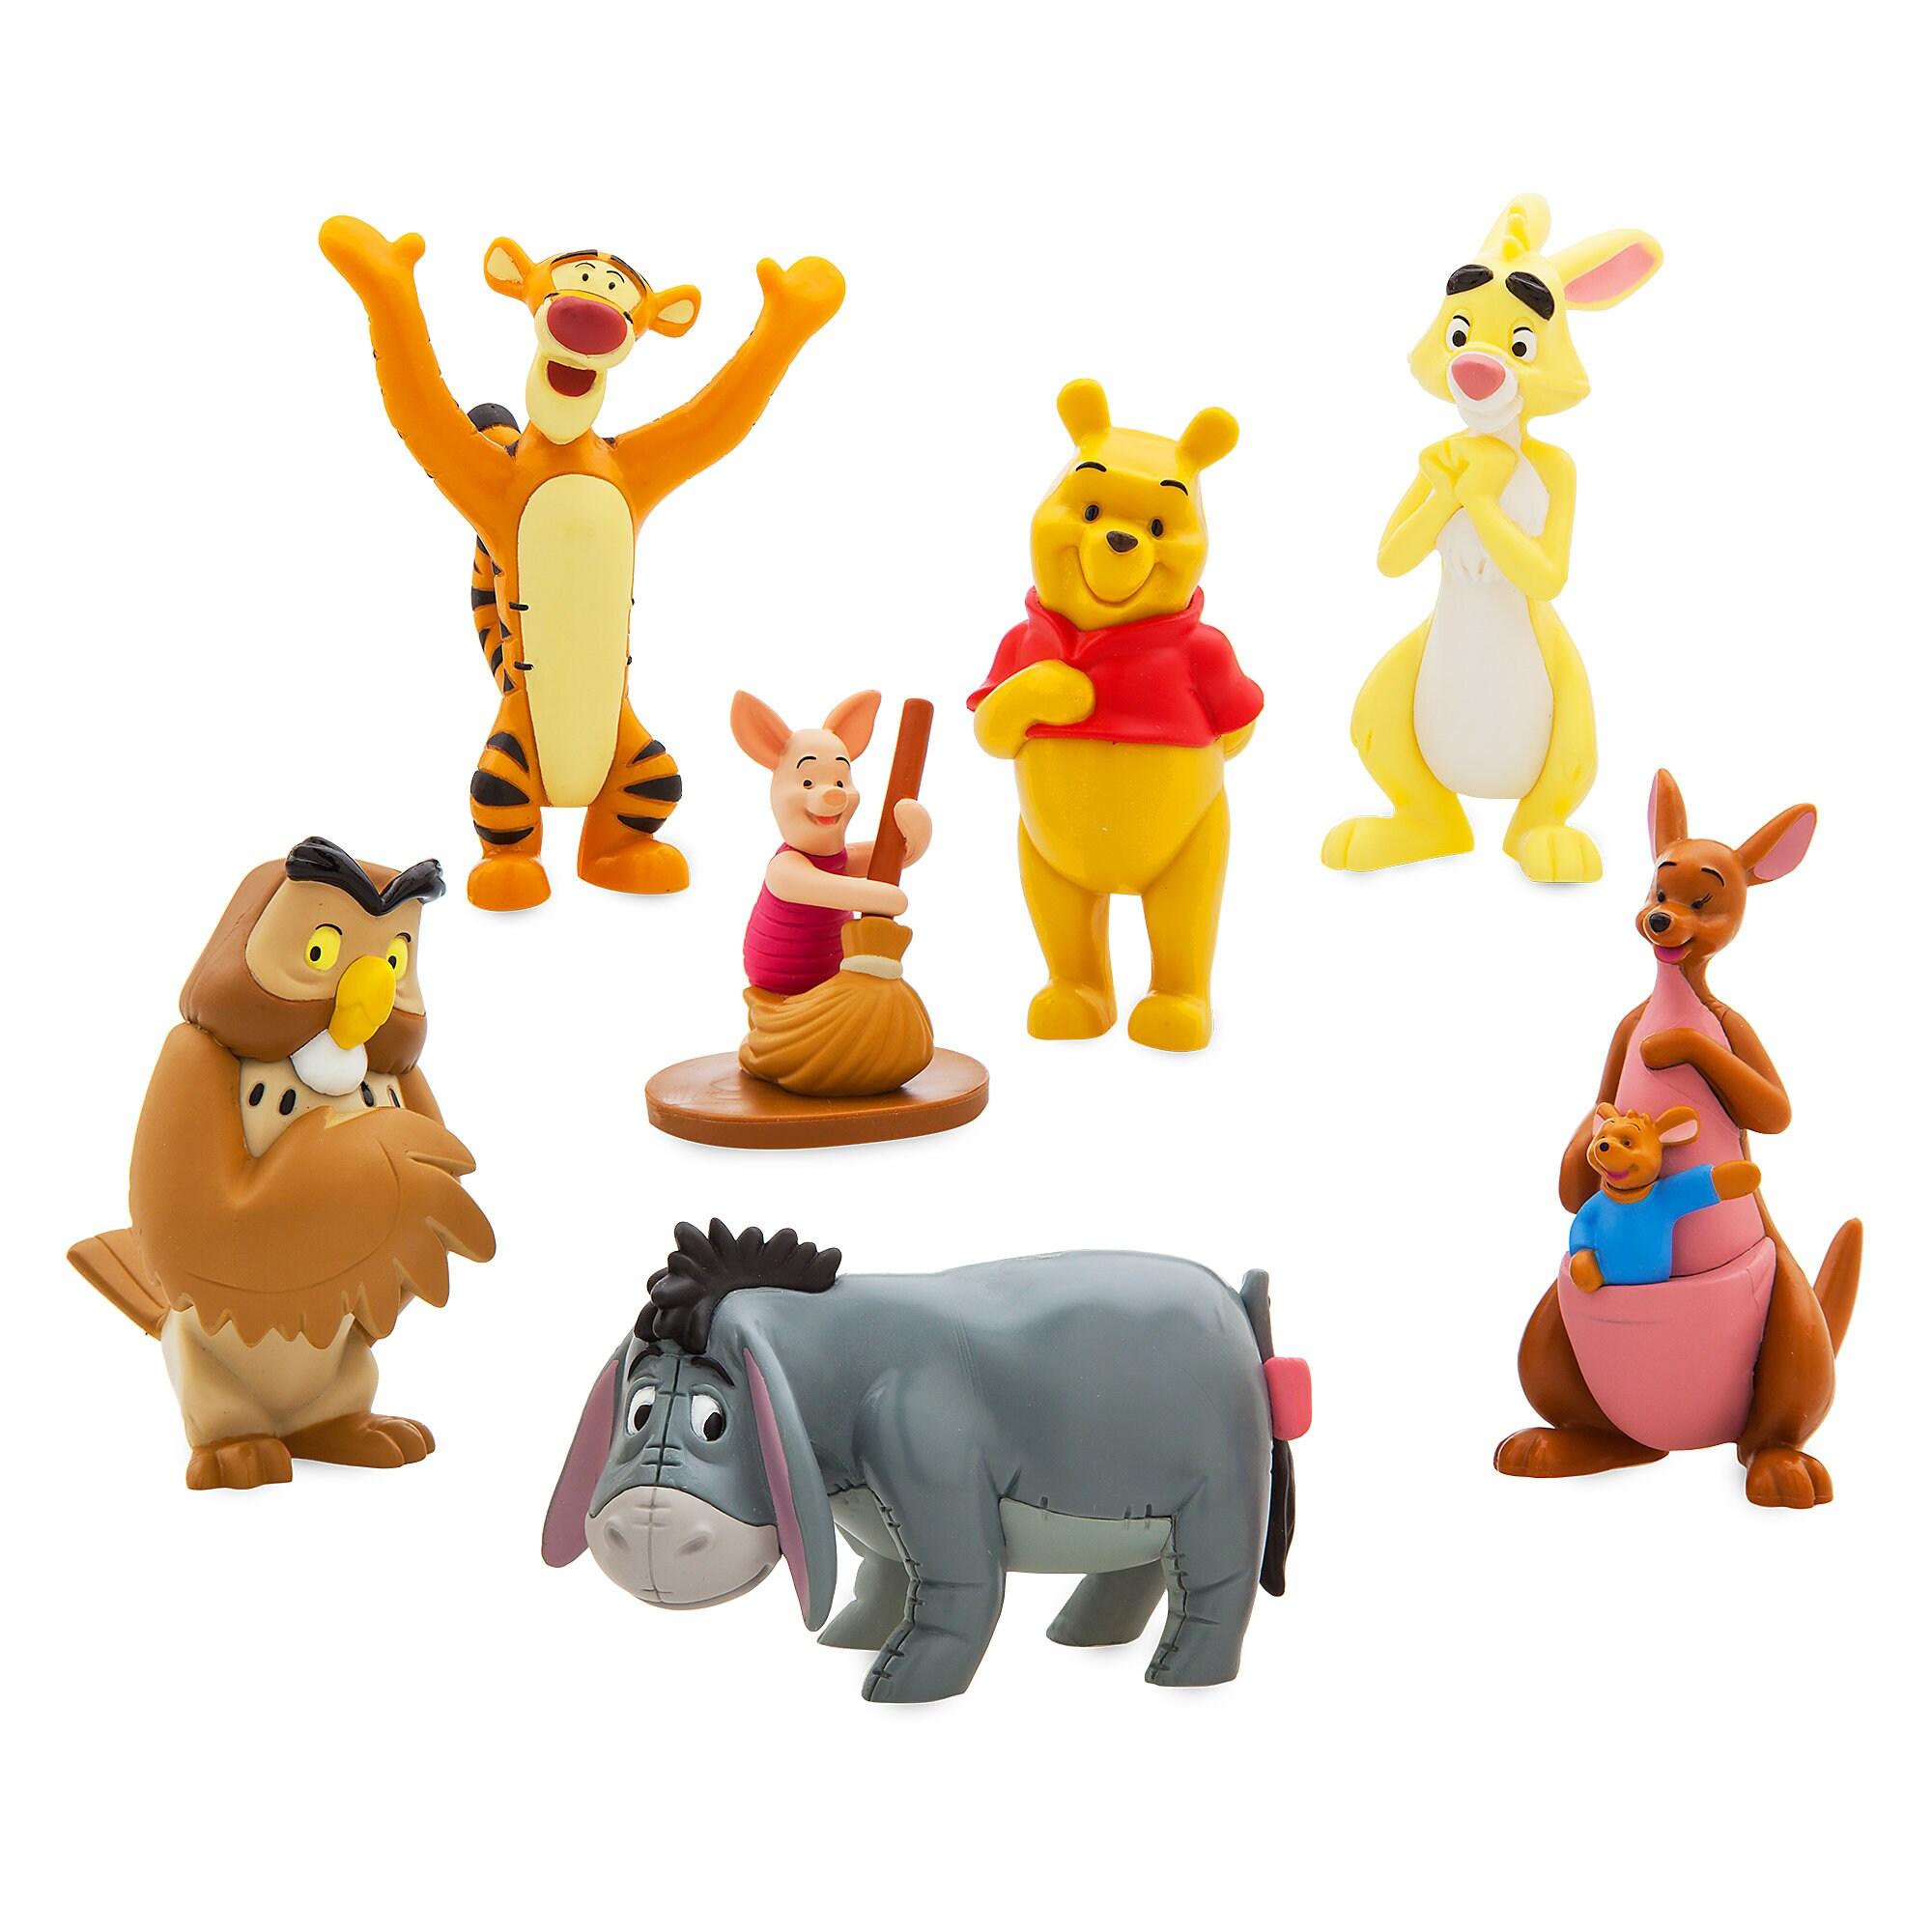 The pooh winnie pics of